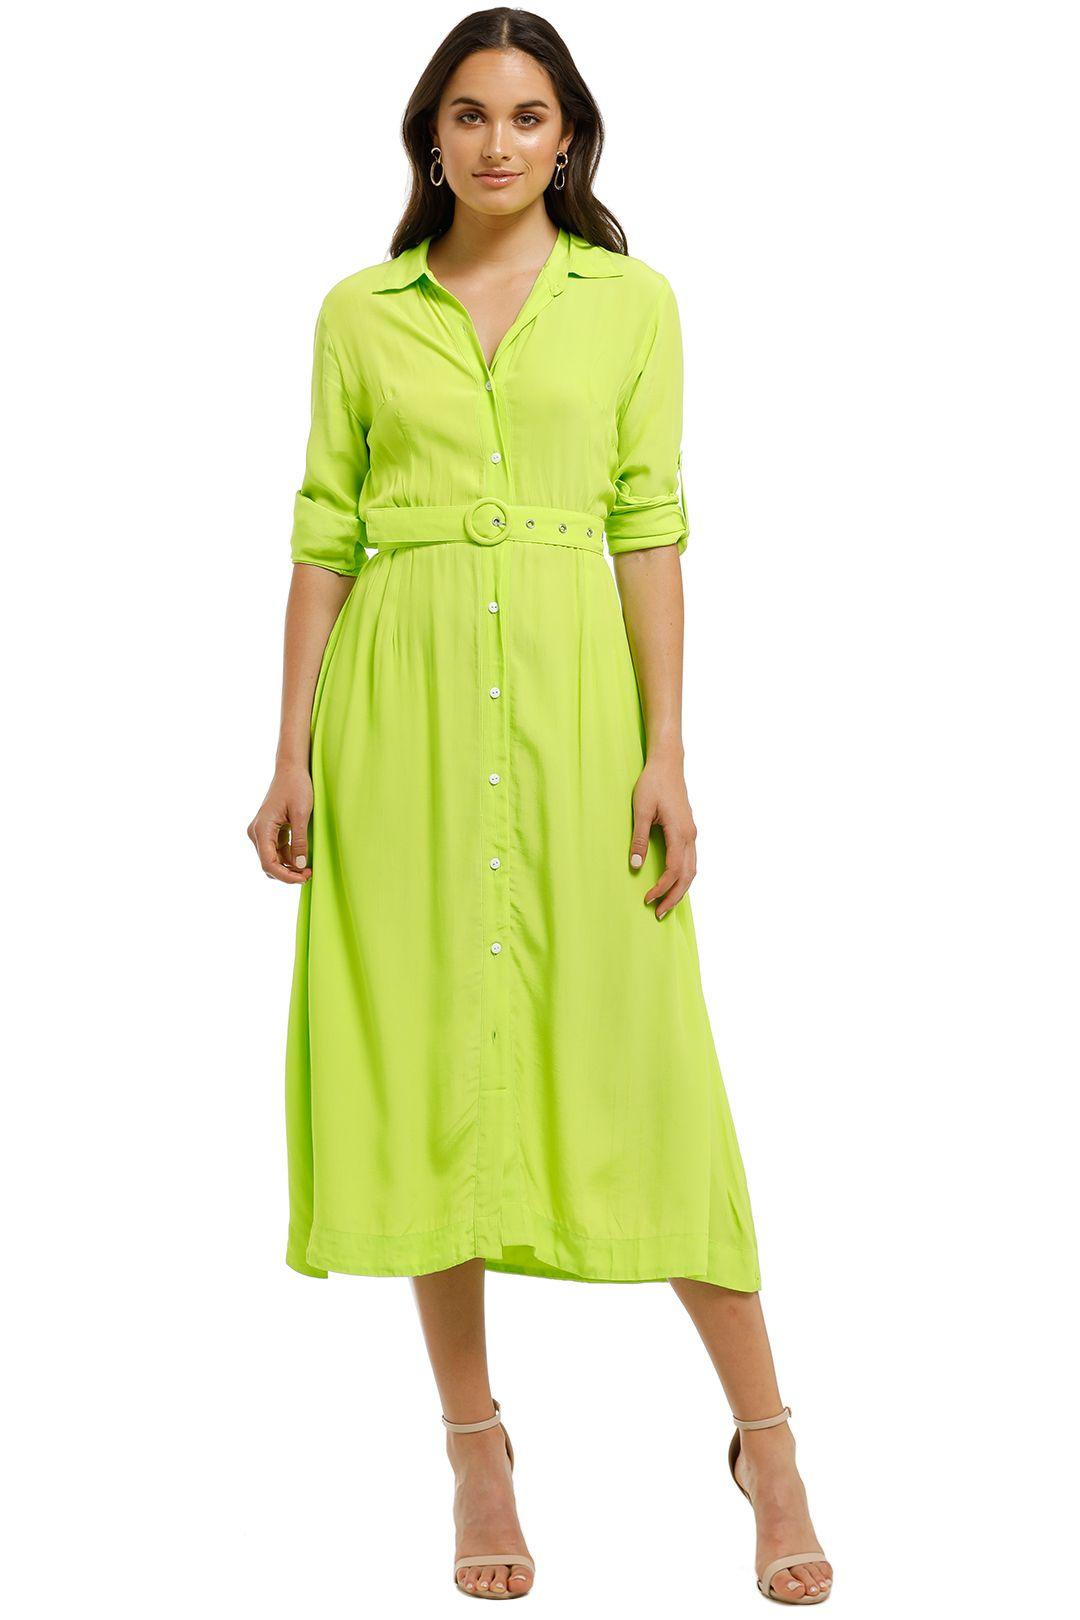 SWF-Lime-LS-Shirt-Dress-Green-Front